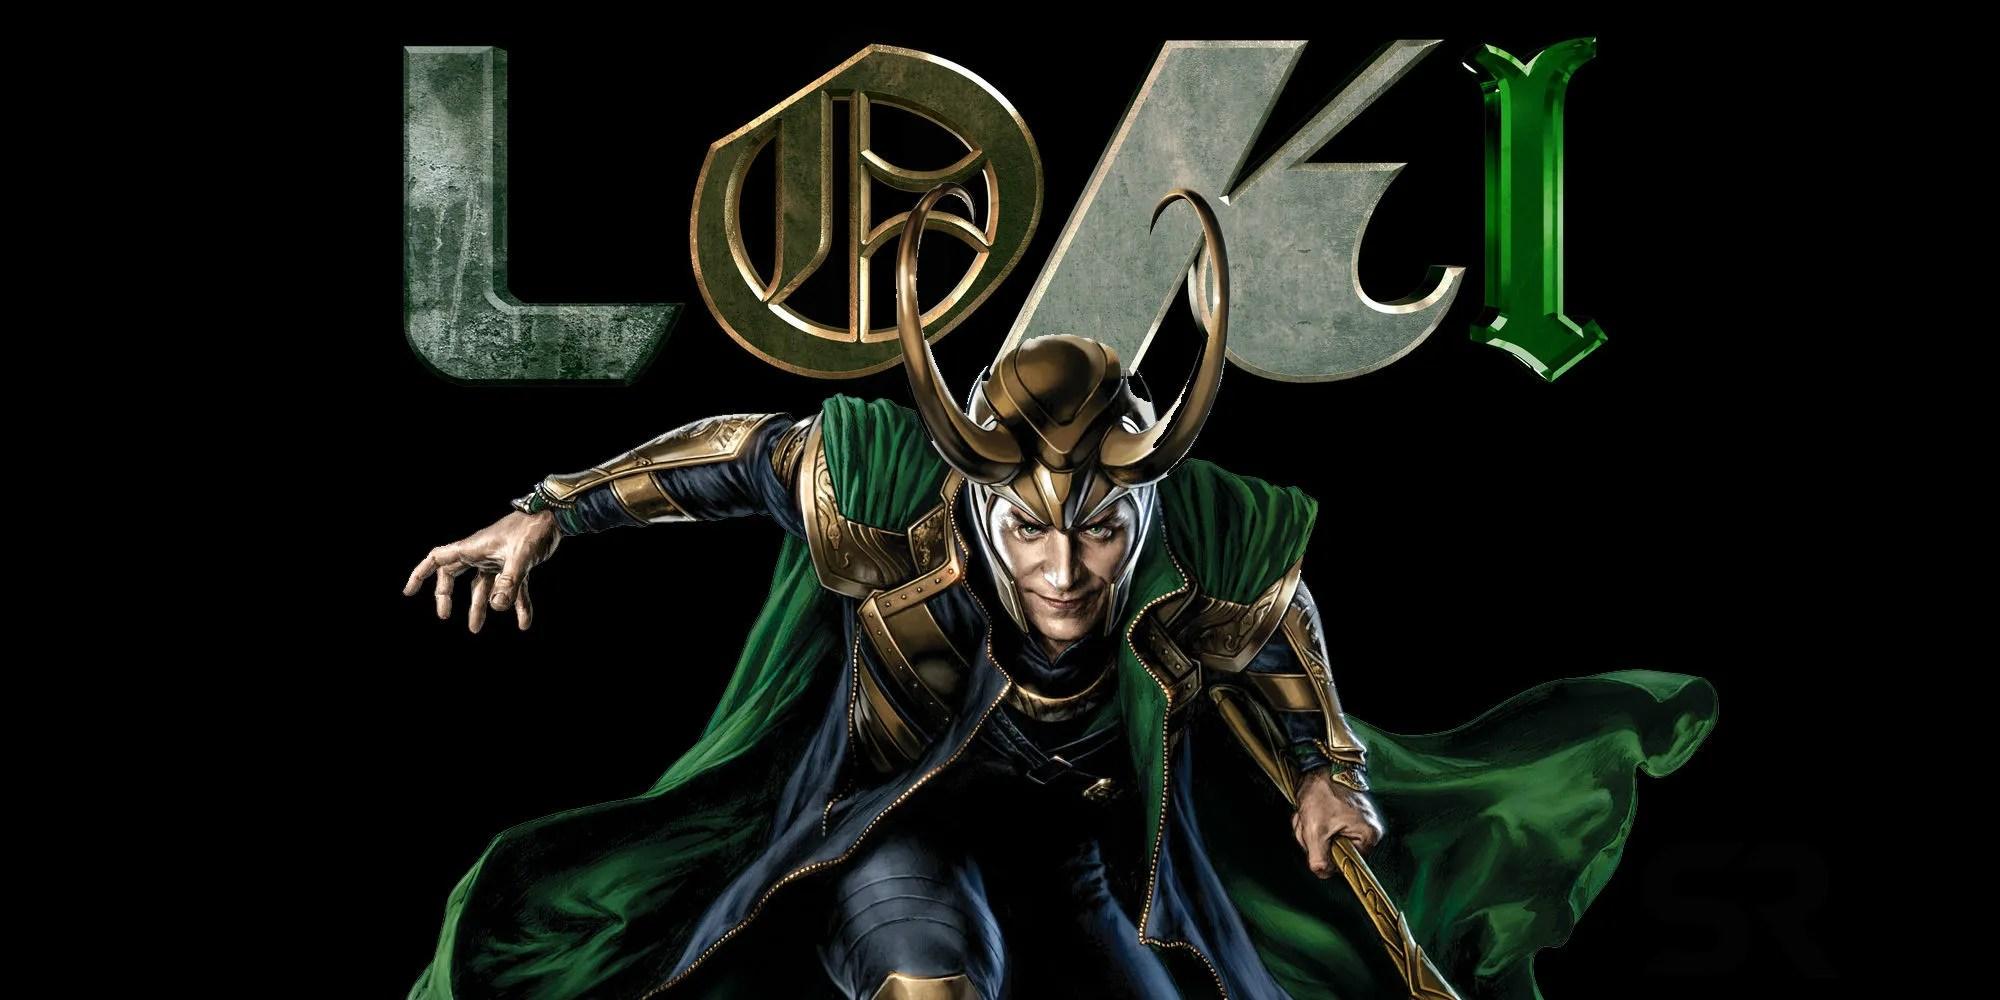 Loki TV Show Starts Production Early Next Year. Says Tom Hiddleston